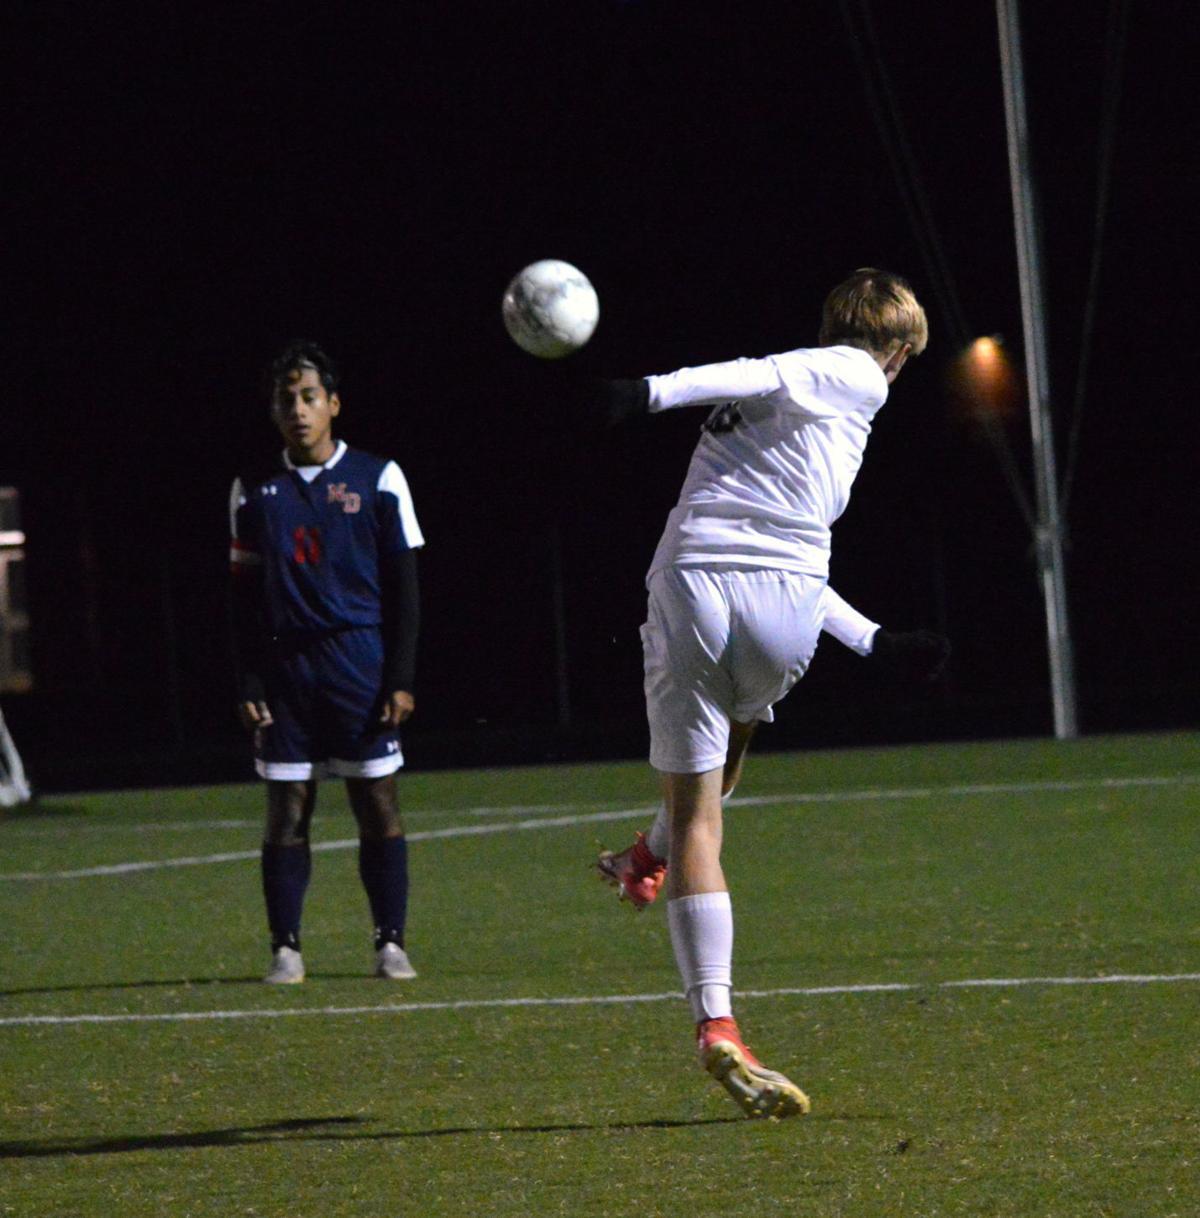 High School Soccer: Cambridge-South Dorchester at North Dorchester